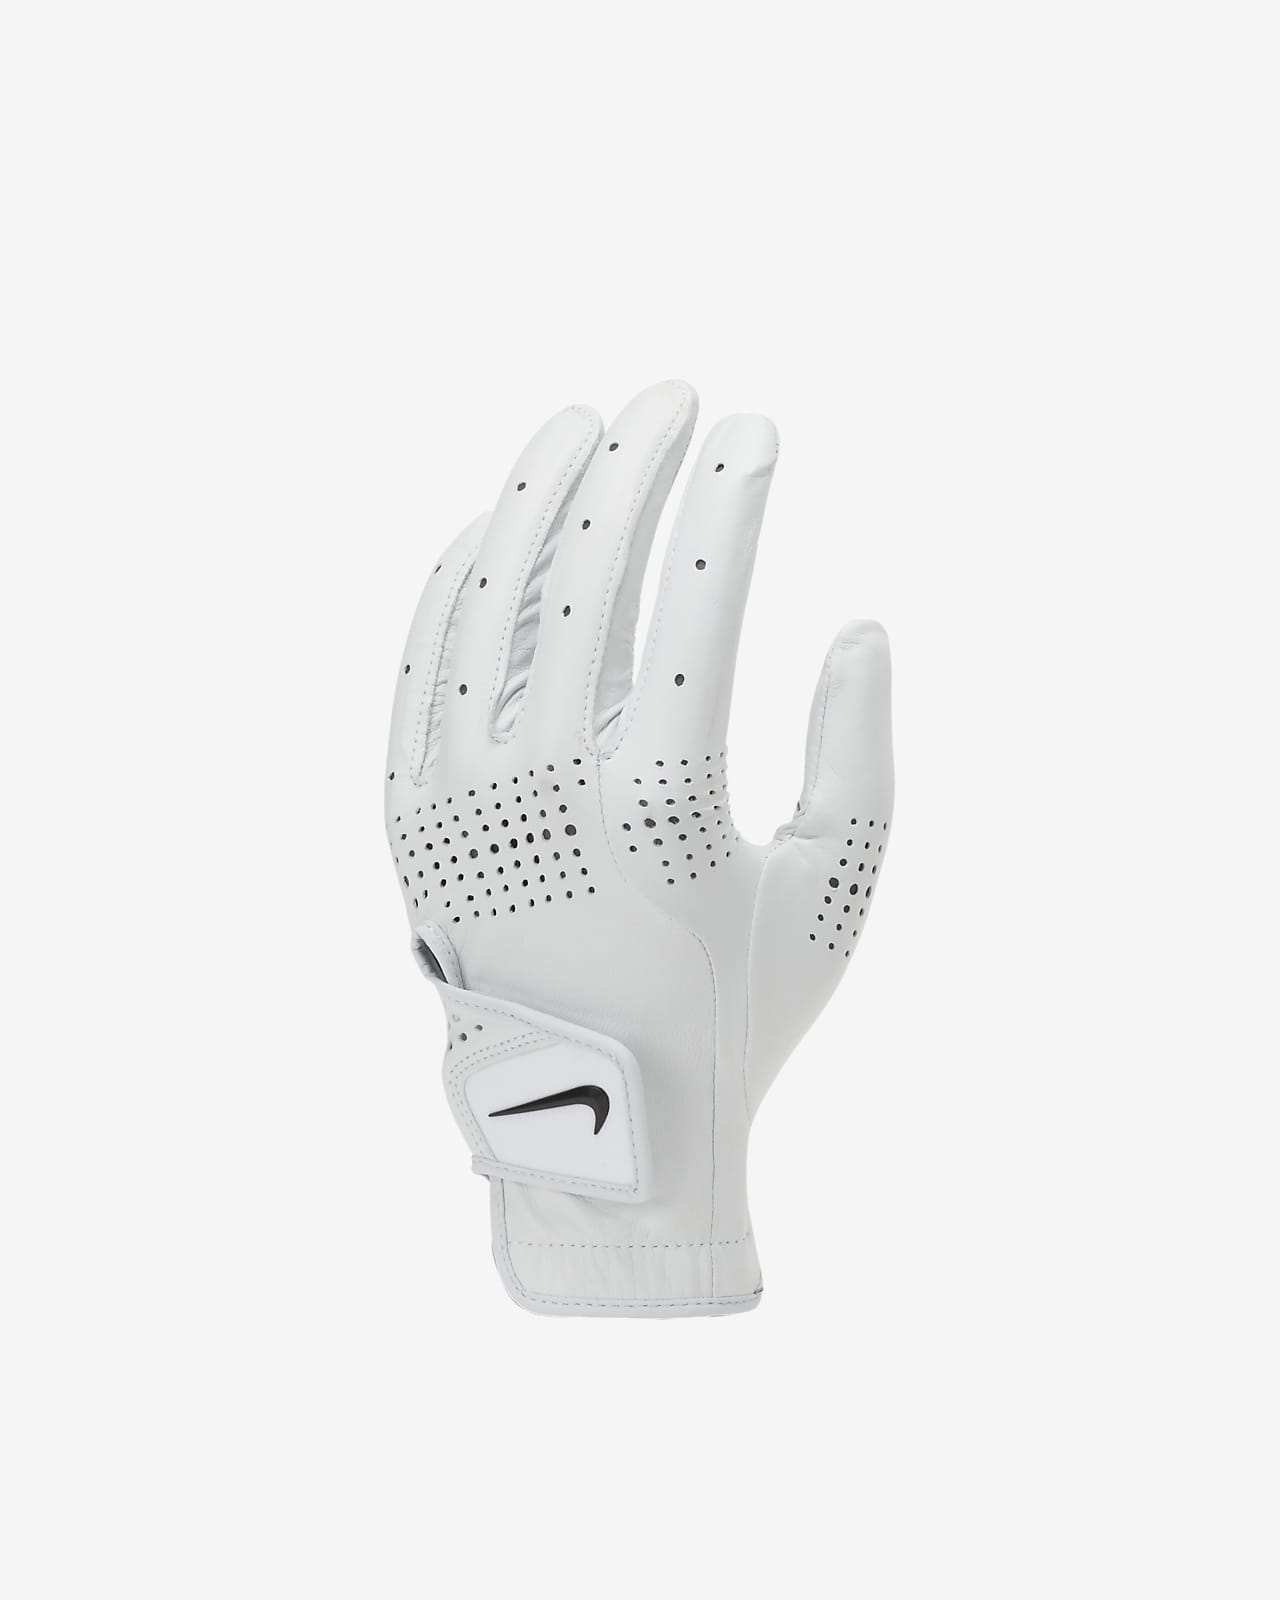 Nike Tour Classic 3 Women's Golf Glove (Left Regular)